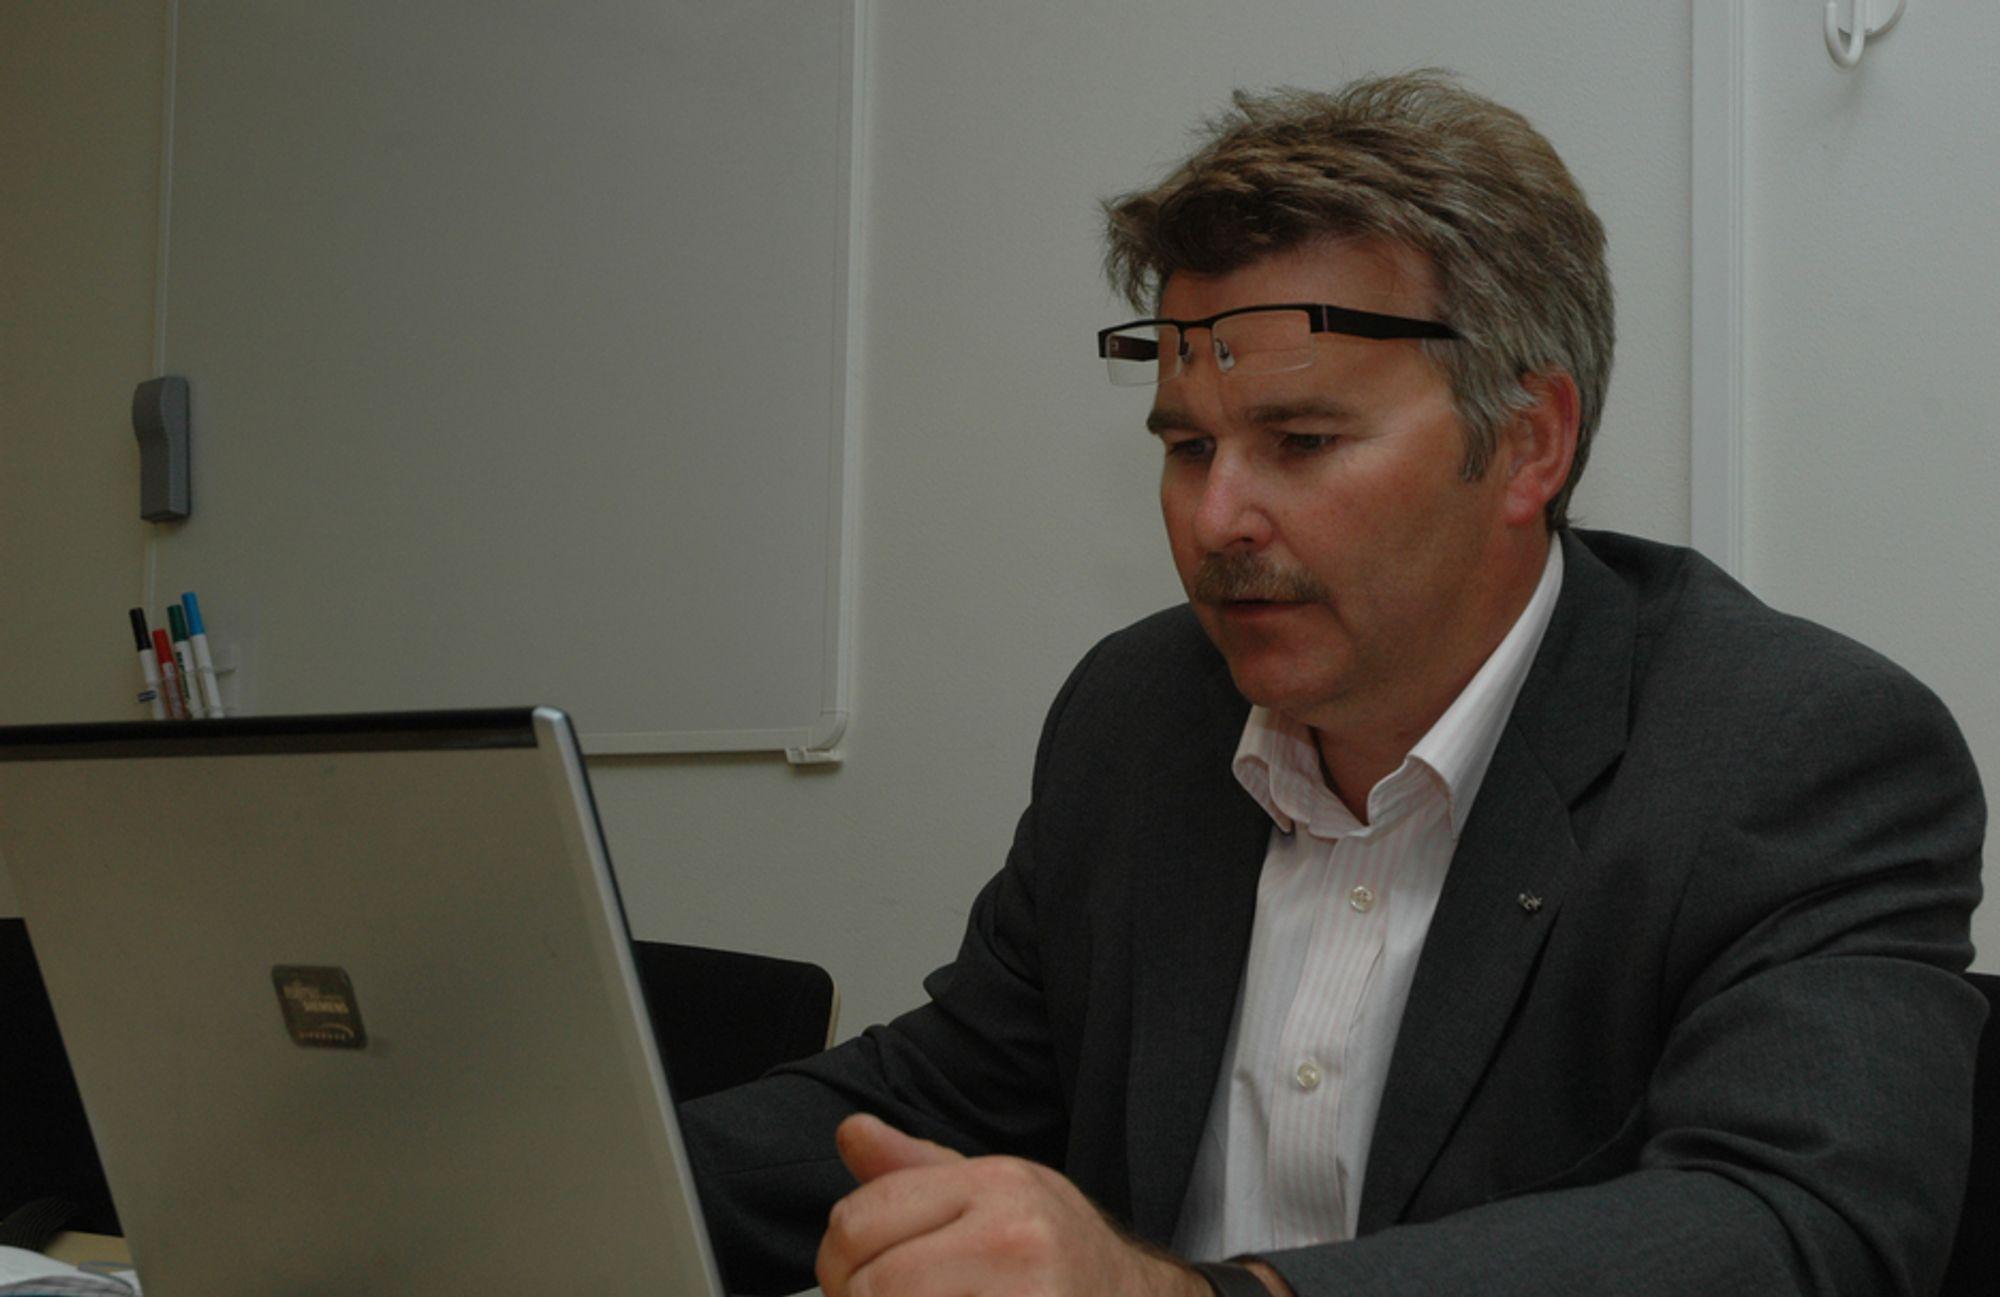 Adm.dir i NCC Norge, Sven Christian Ulvatne.